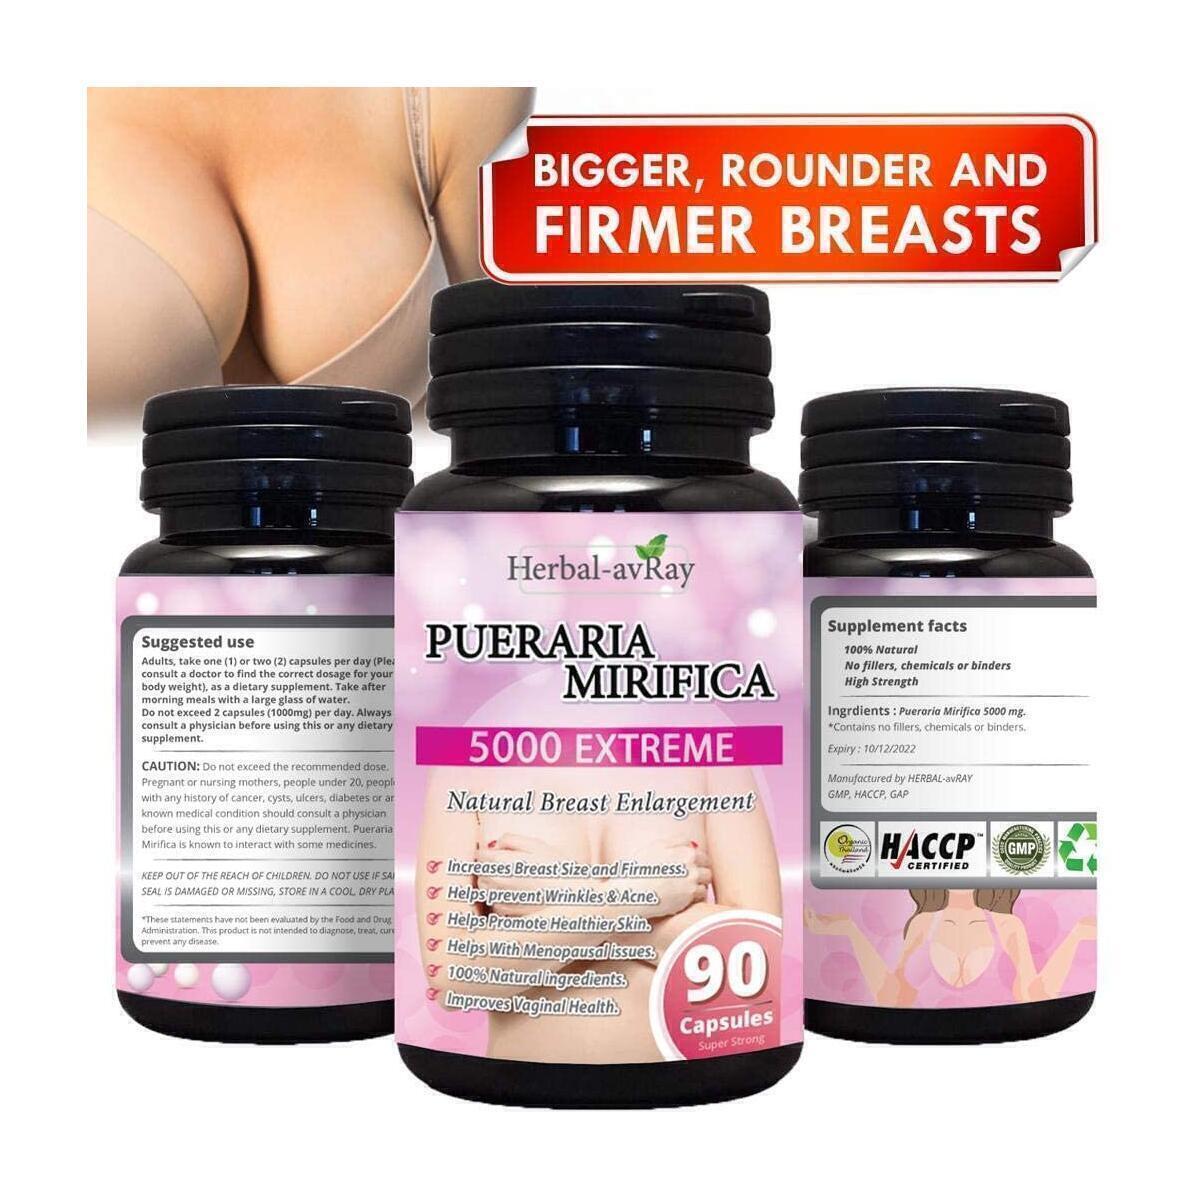 Pueraria Mirifica Capsules 5000mg | Natural Breast Enhancement Pills for Women | Breast Enlargement Pills | Breast Enlarger, Vaginal Health, Menopause Relief, Skin & Hair Health 90 Vegetarian Capsules